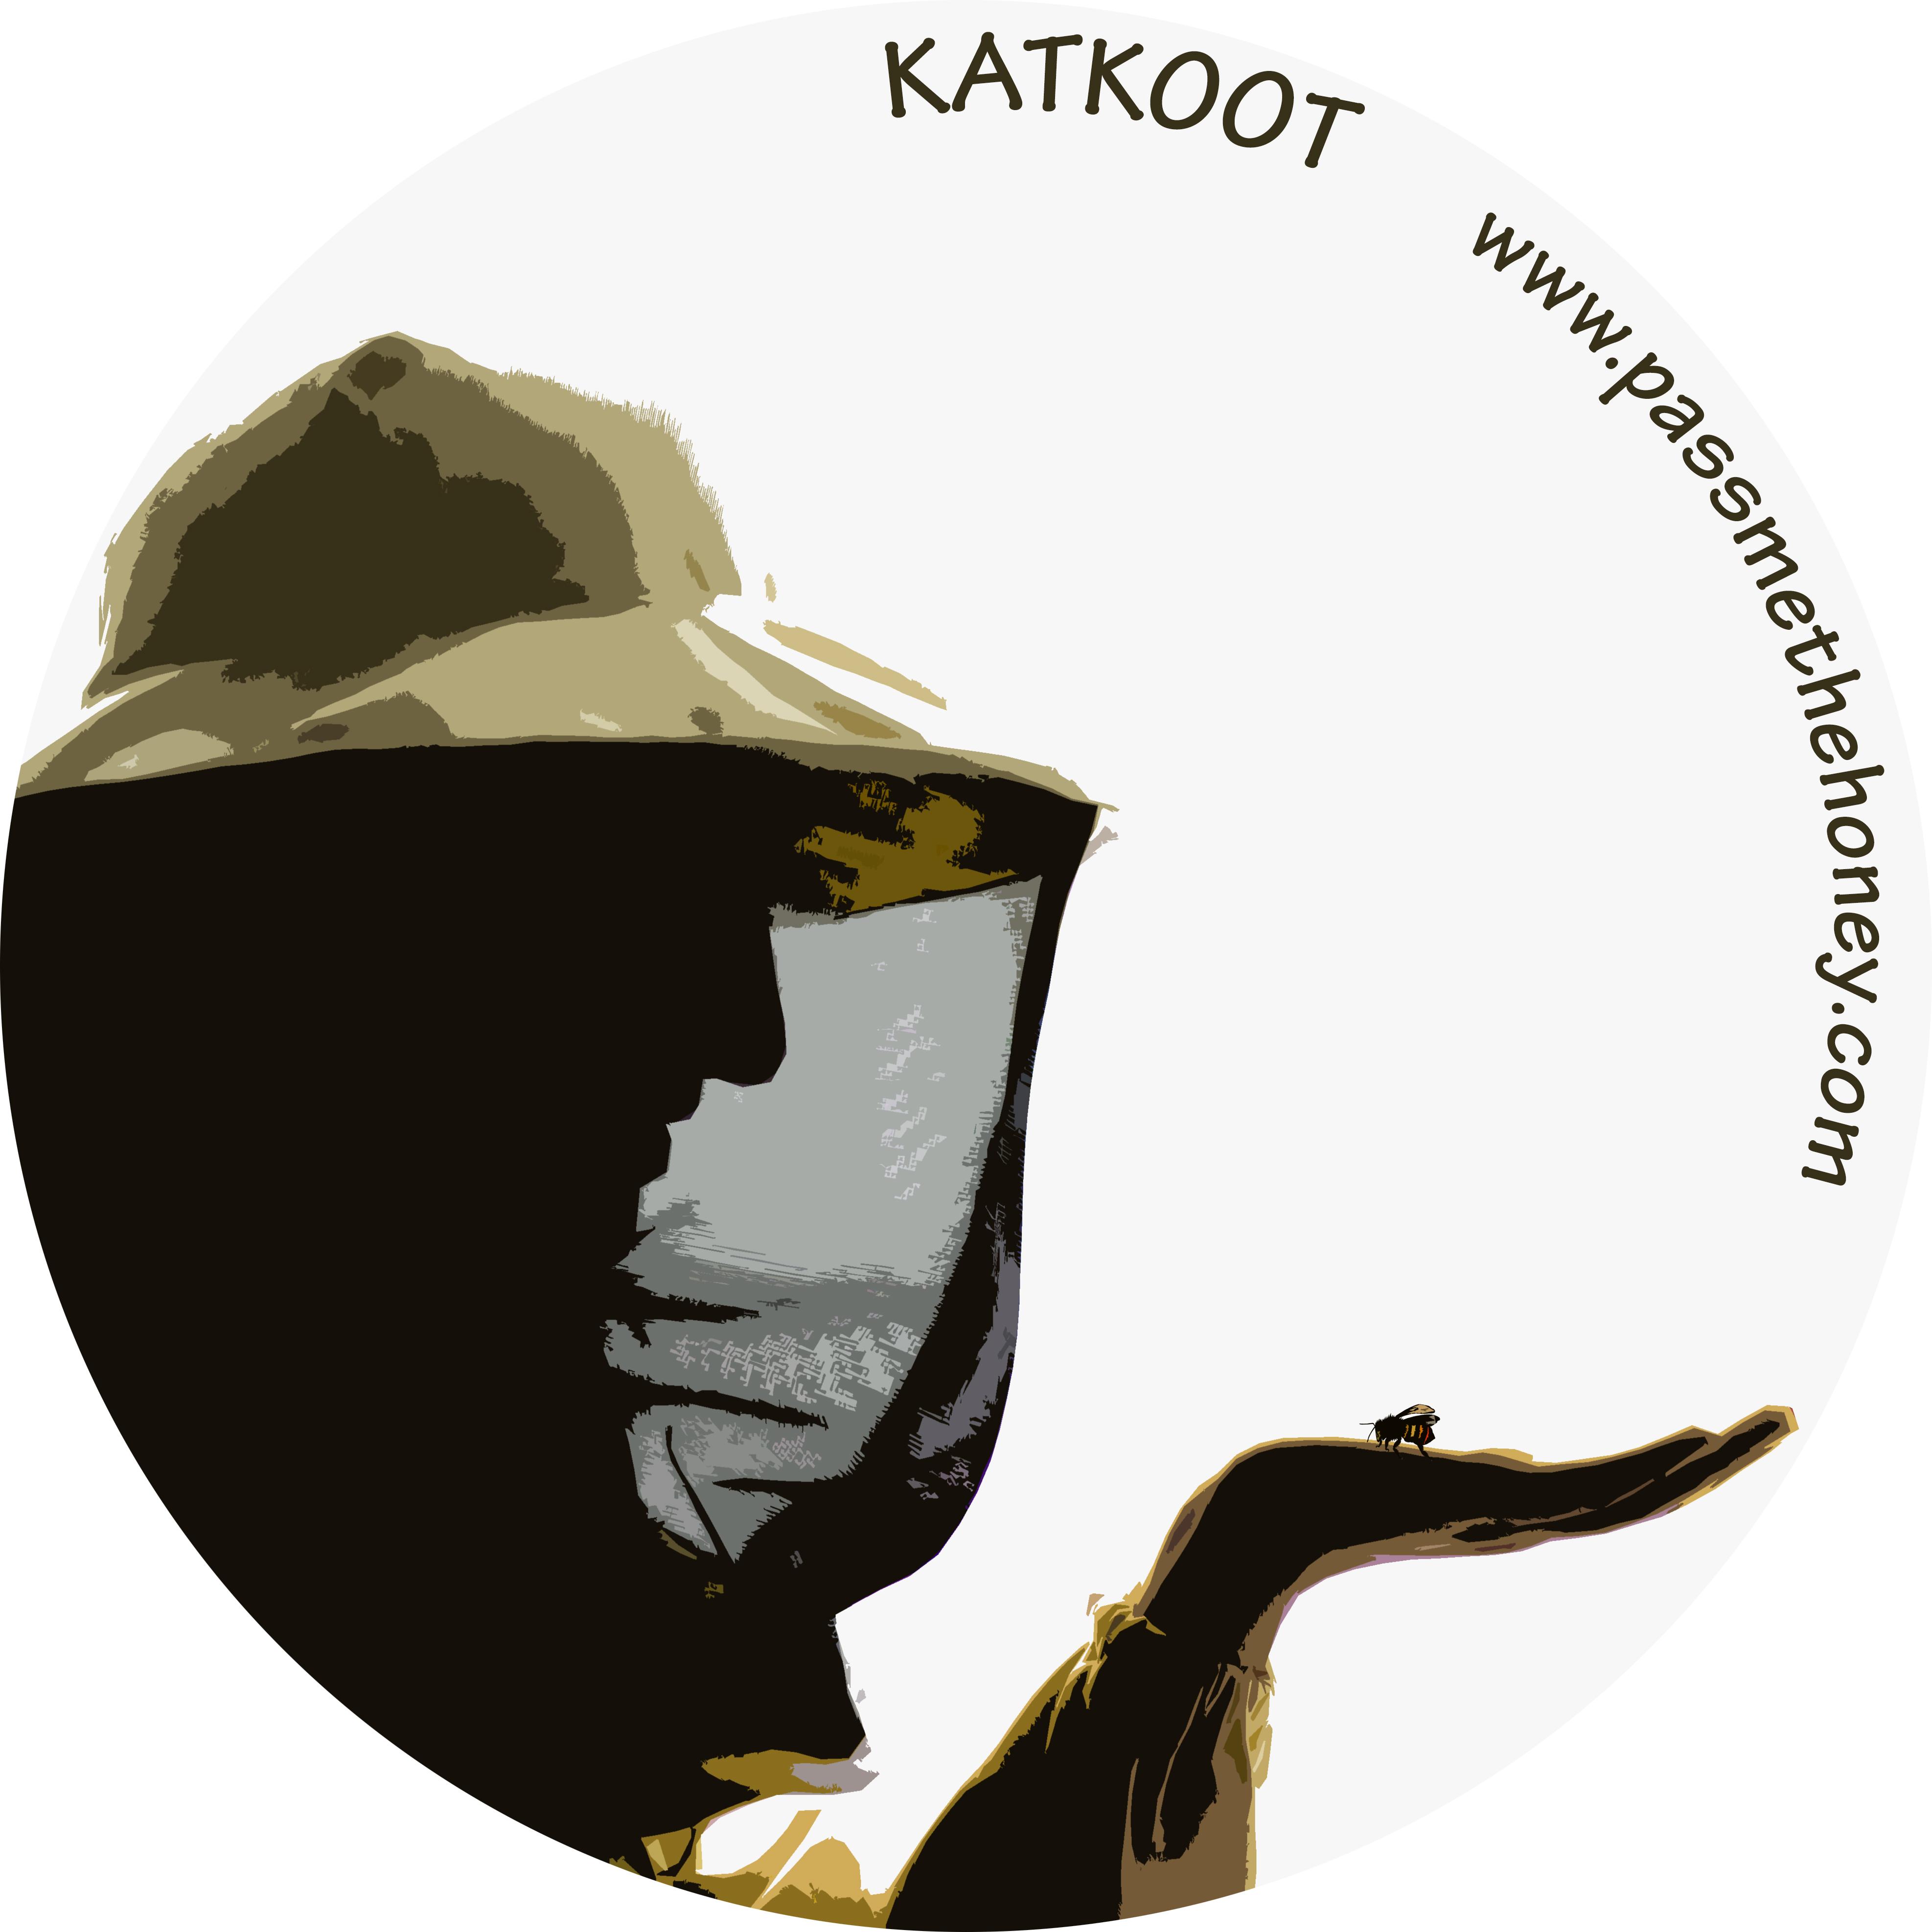 Katkoot's Beehive Stories